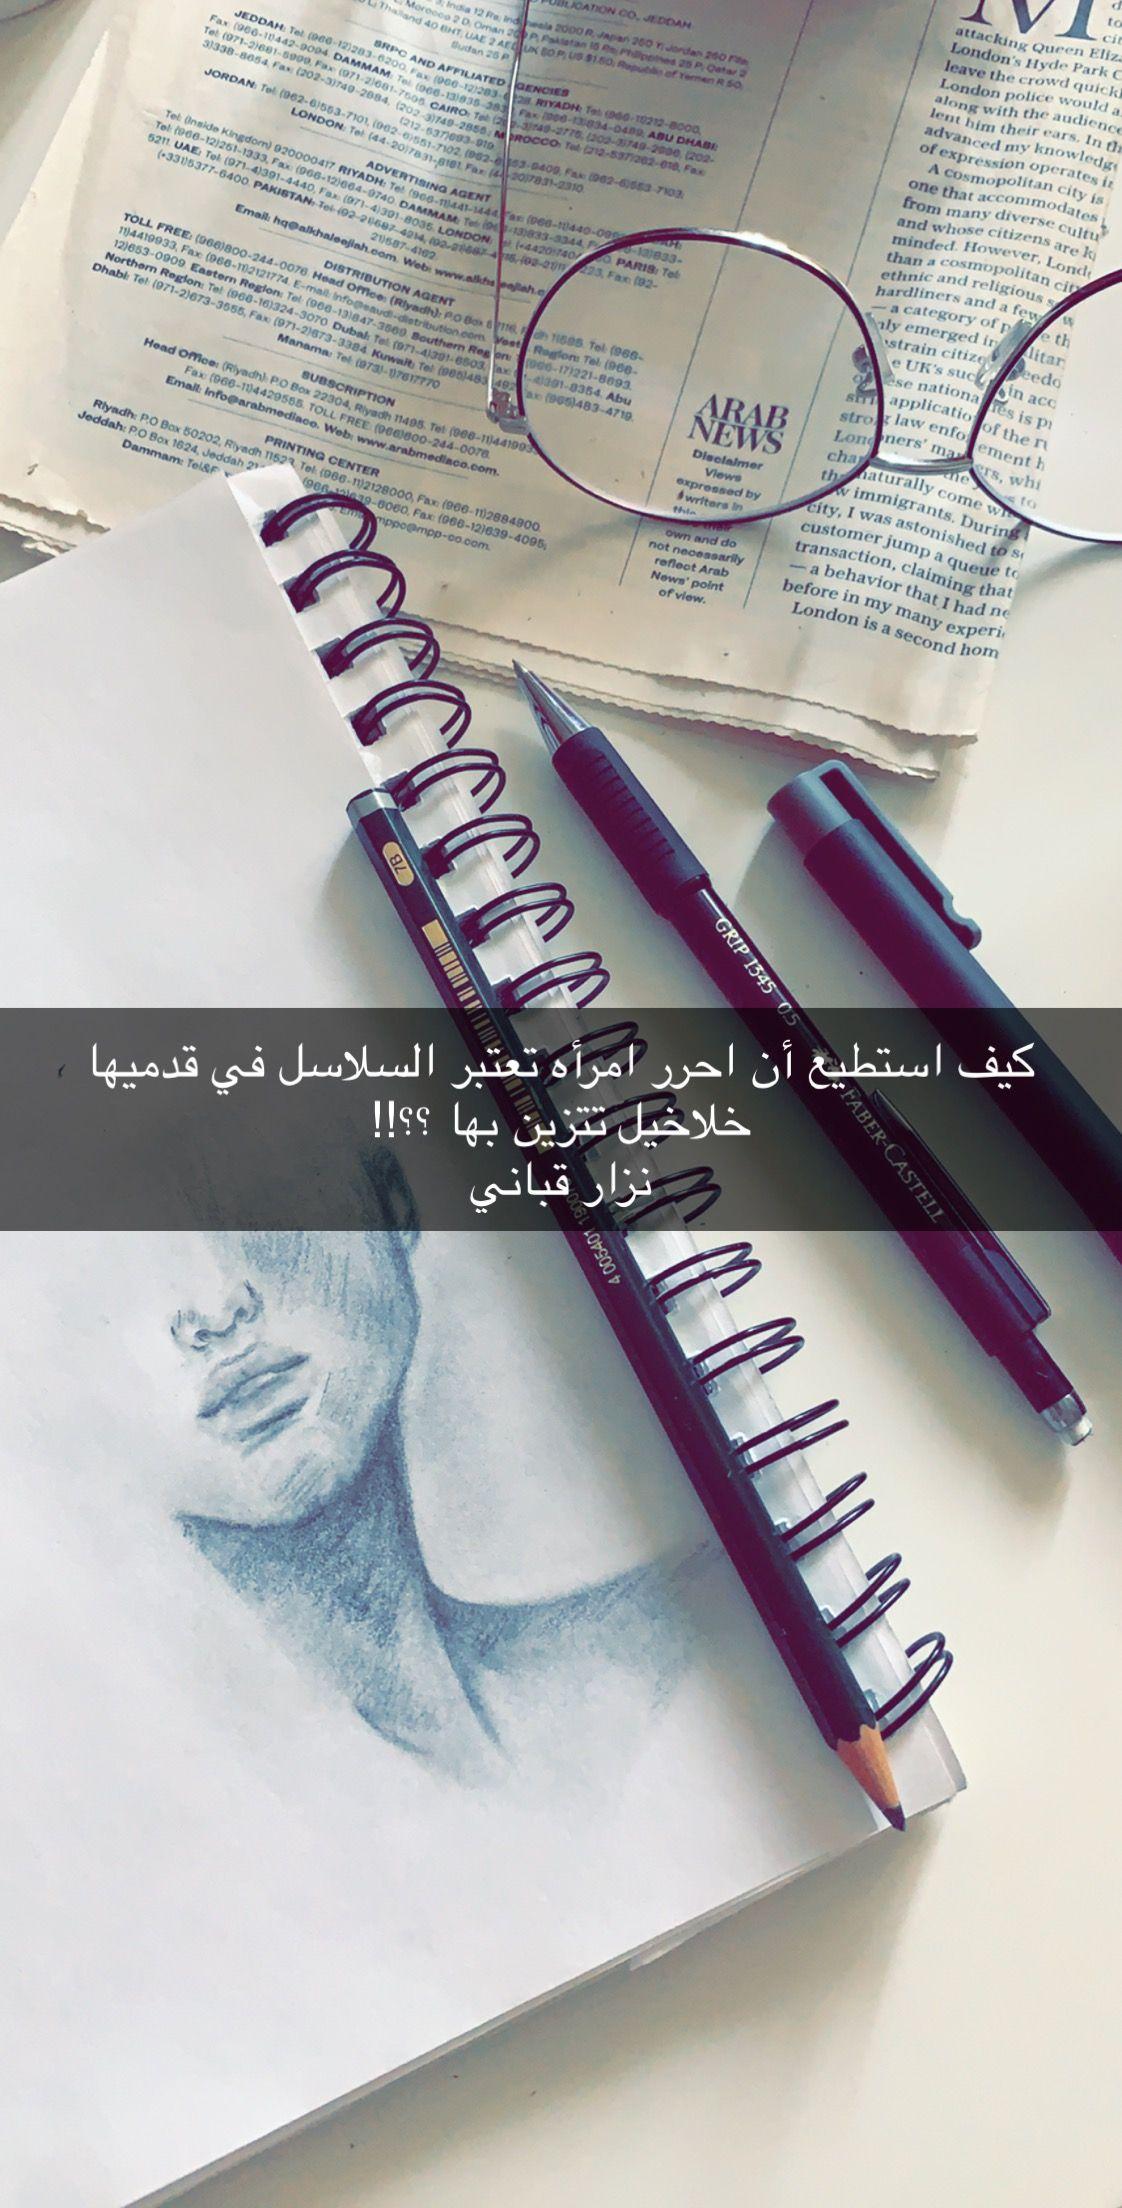 Pin By الملكه ميمي الجمال On سناب نوديتا In 2020 Arabic Funny Tumblr Photography Quotes